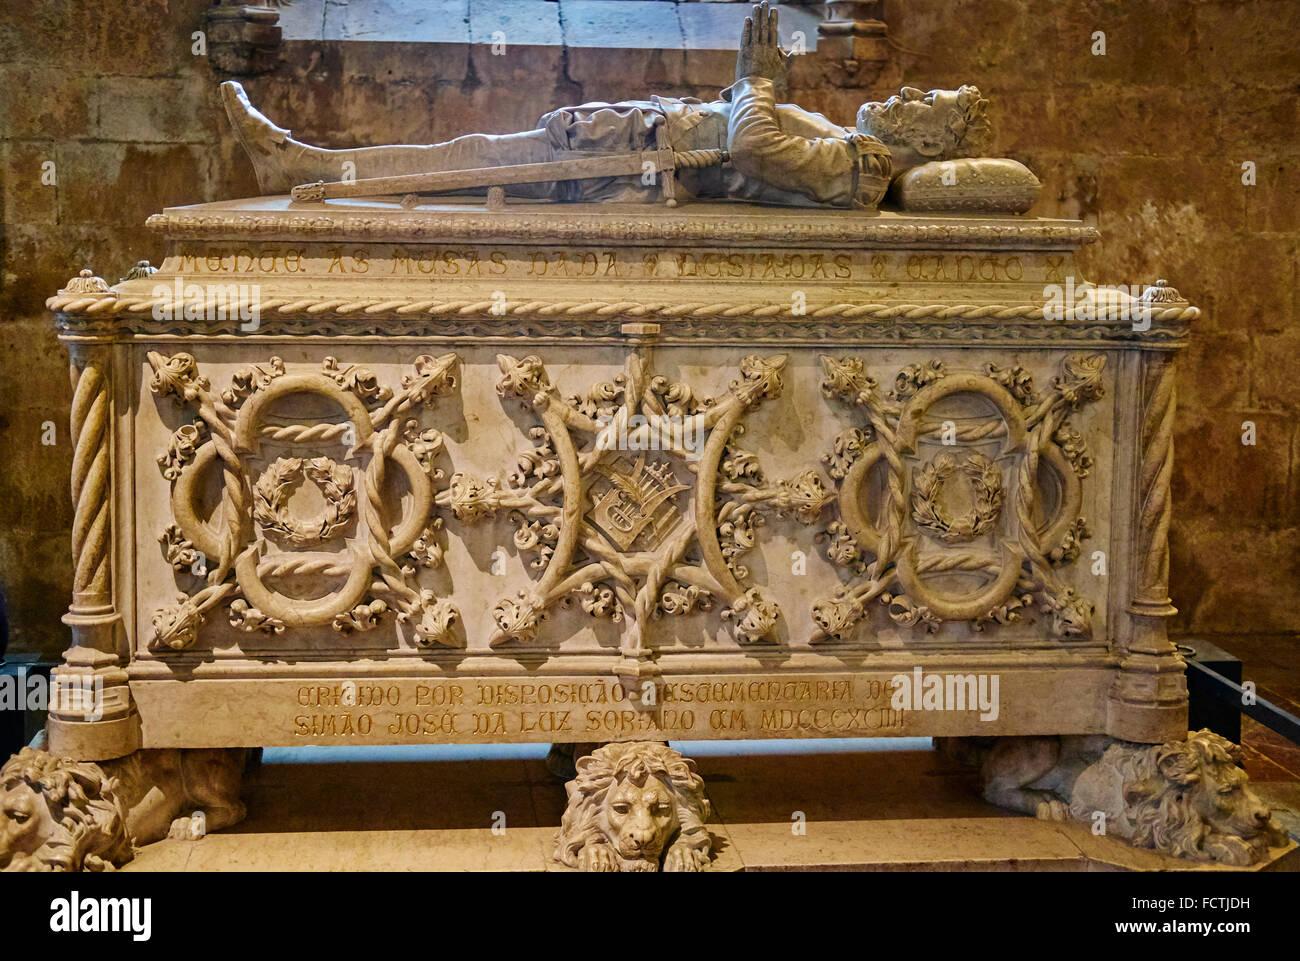 Portugal, Lisbon, mosteiro dos Jeronimos, Jeronimos monastery, UNESCO world heritage, gravestone of Luis Vaz de - Stock Image